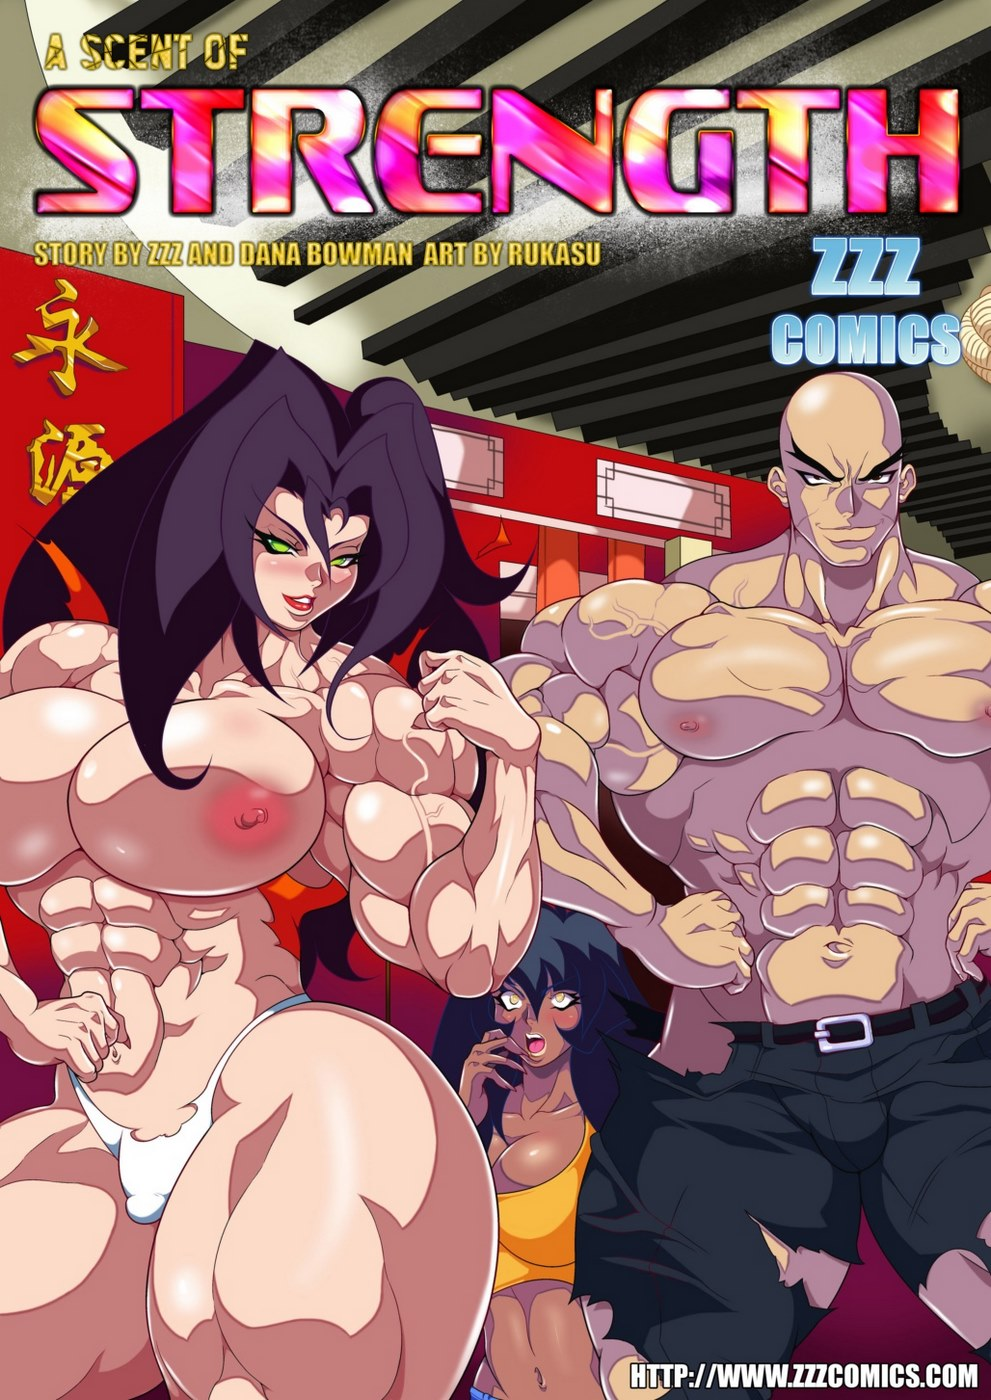 Porn Comics - ZZZ -A Scent of Strength porn comics 8 muses